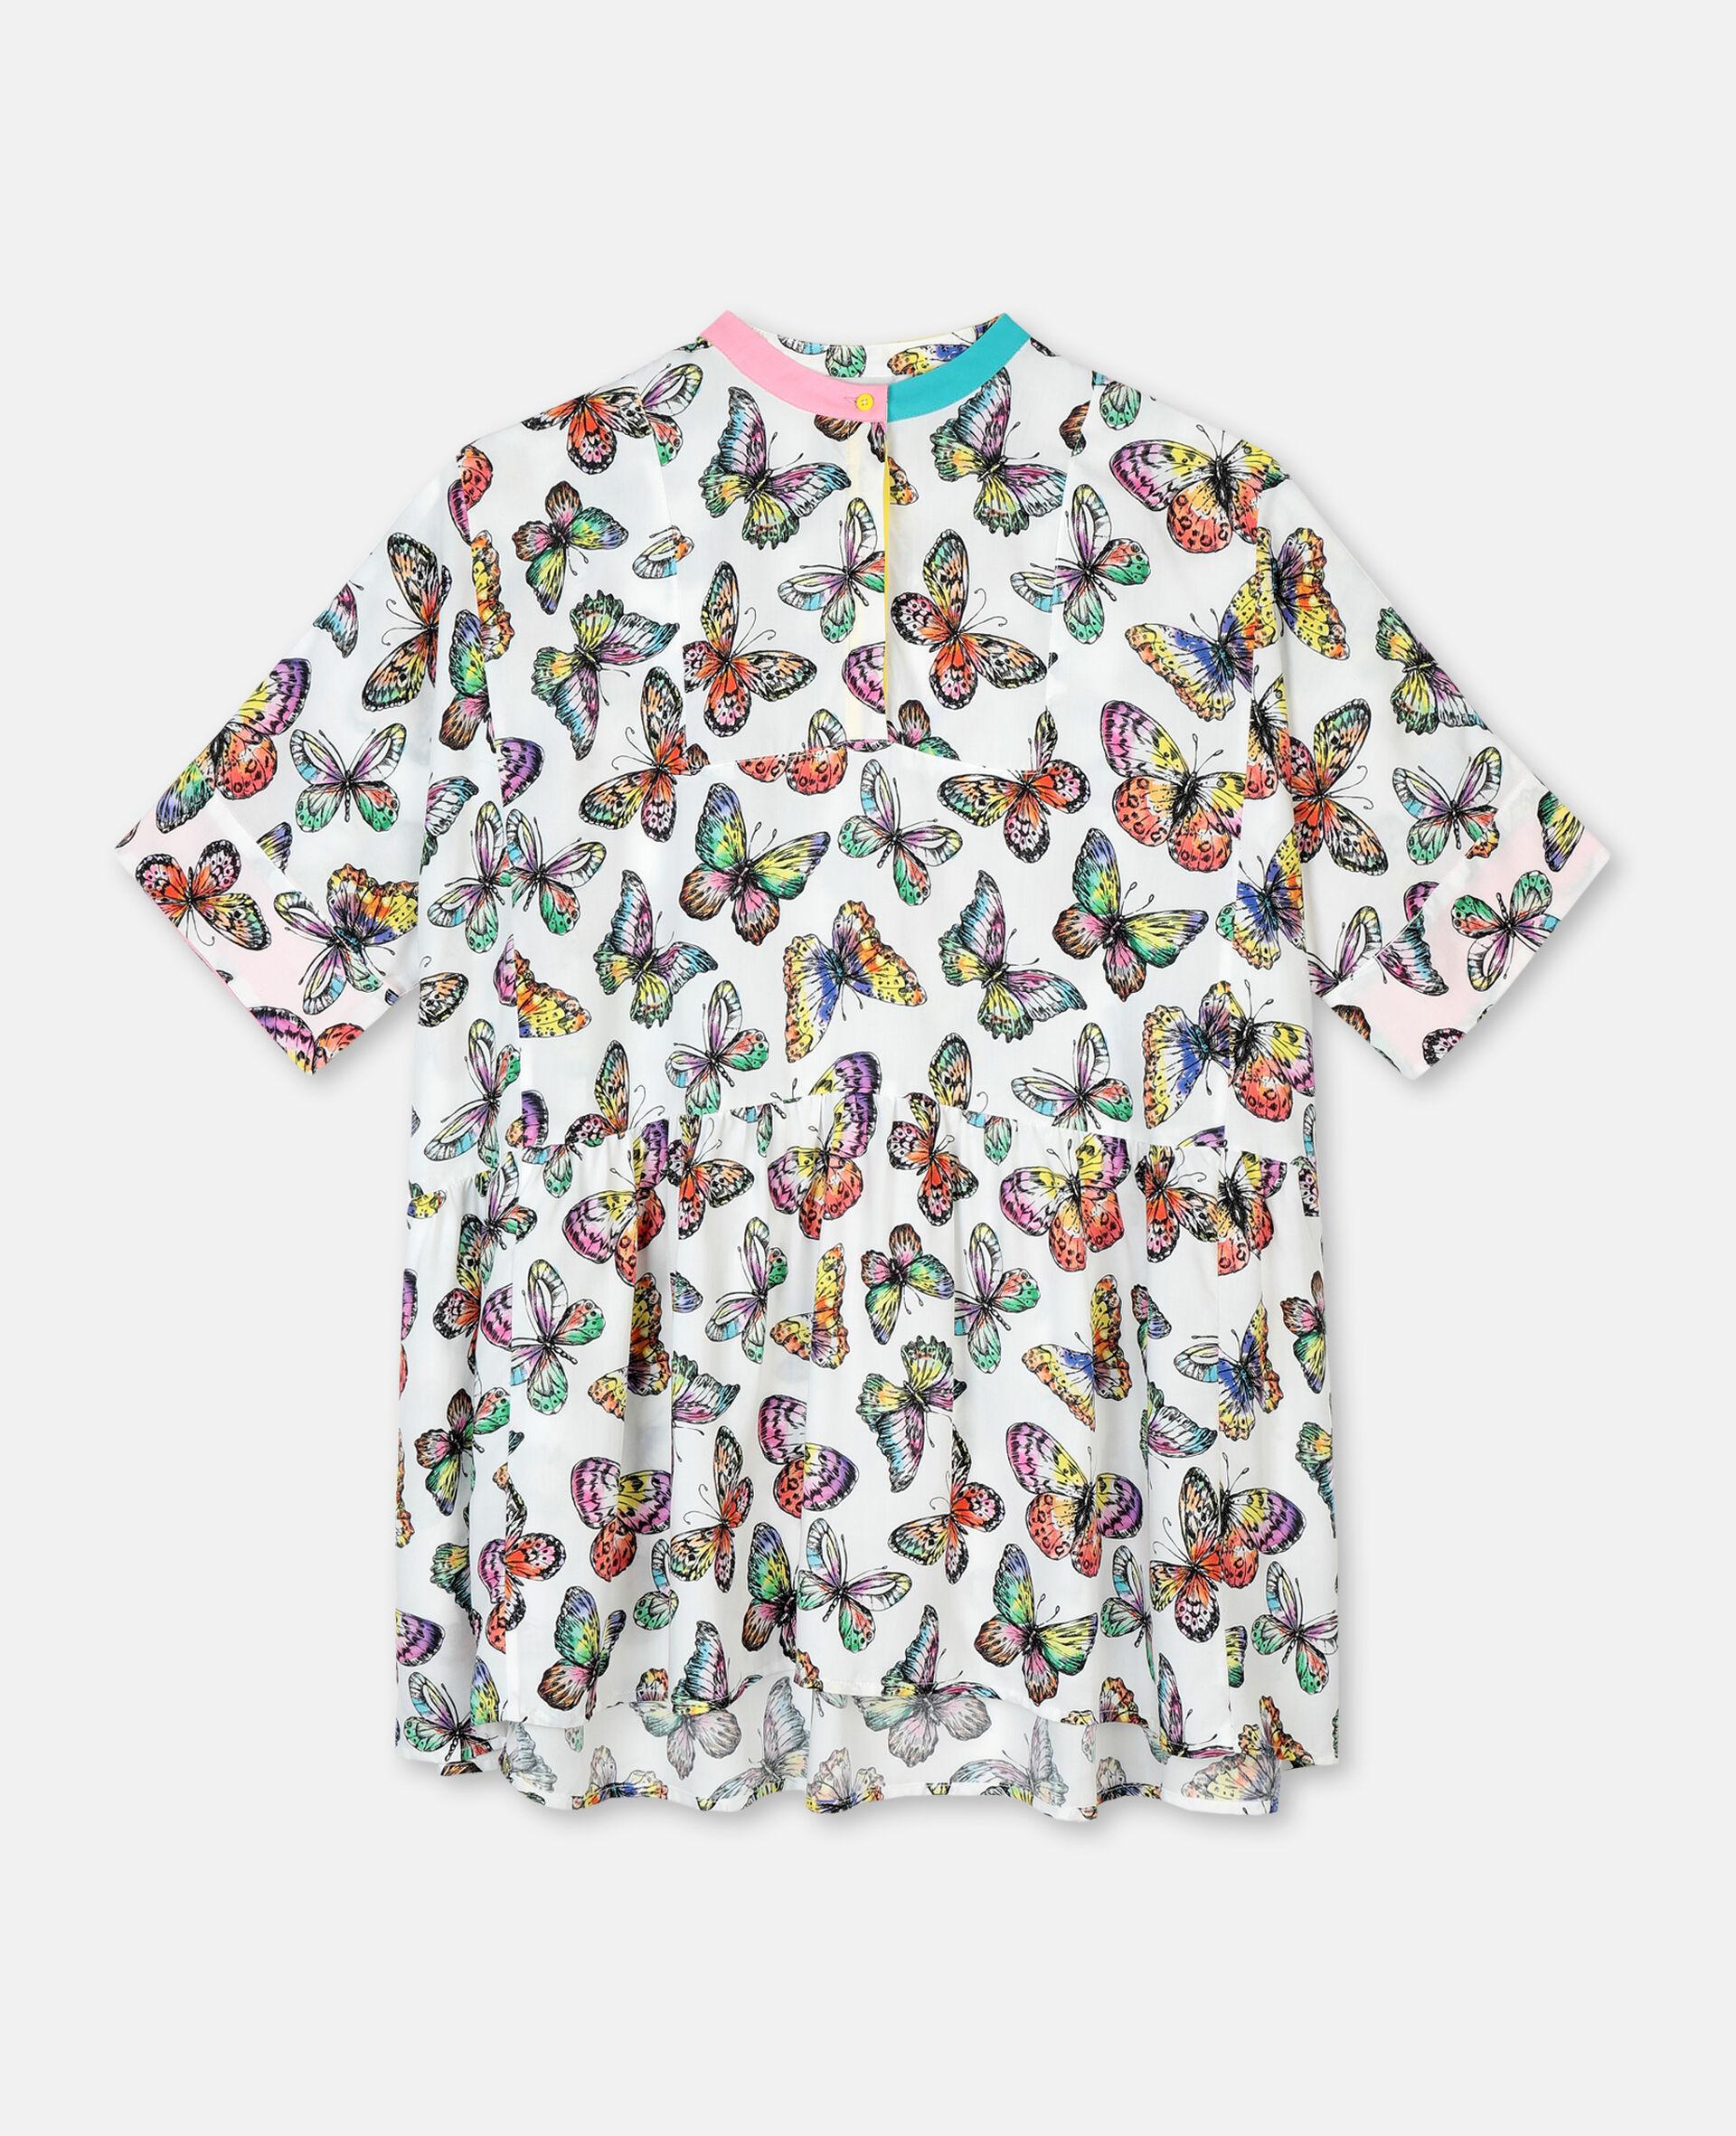 Oversized-Kleid aus Viskose mit Schmetterlingen-Bunt-large image number 0